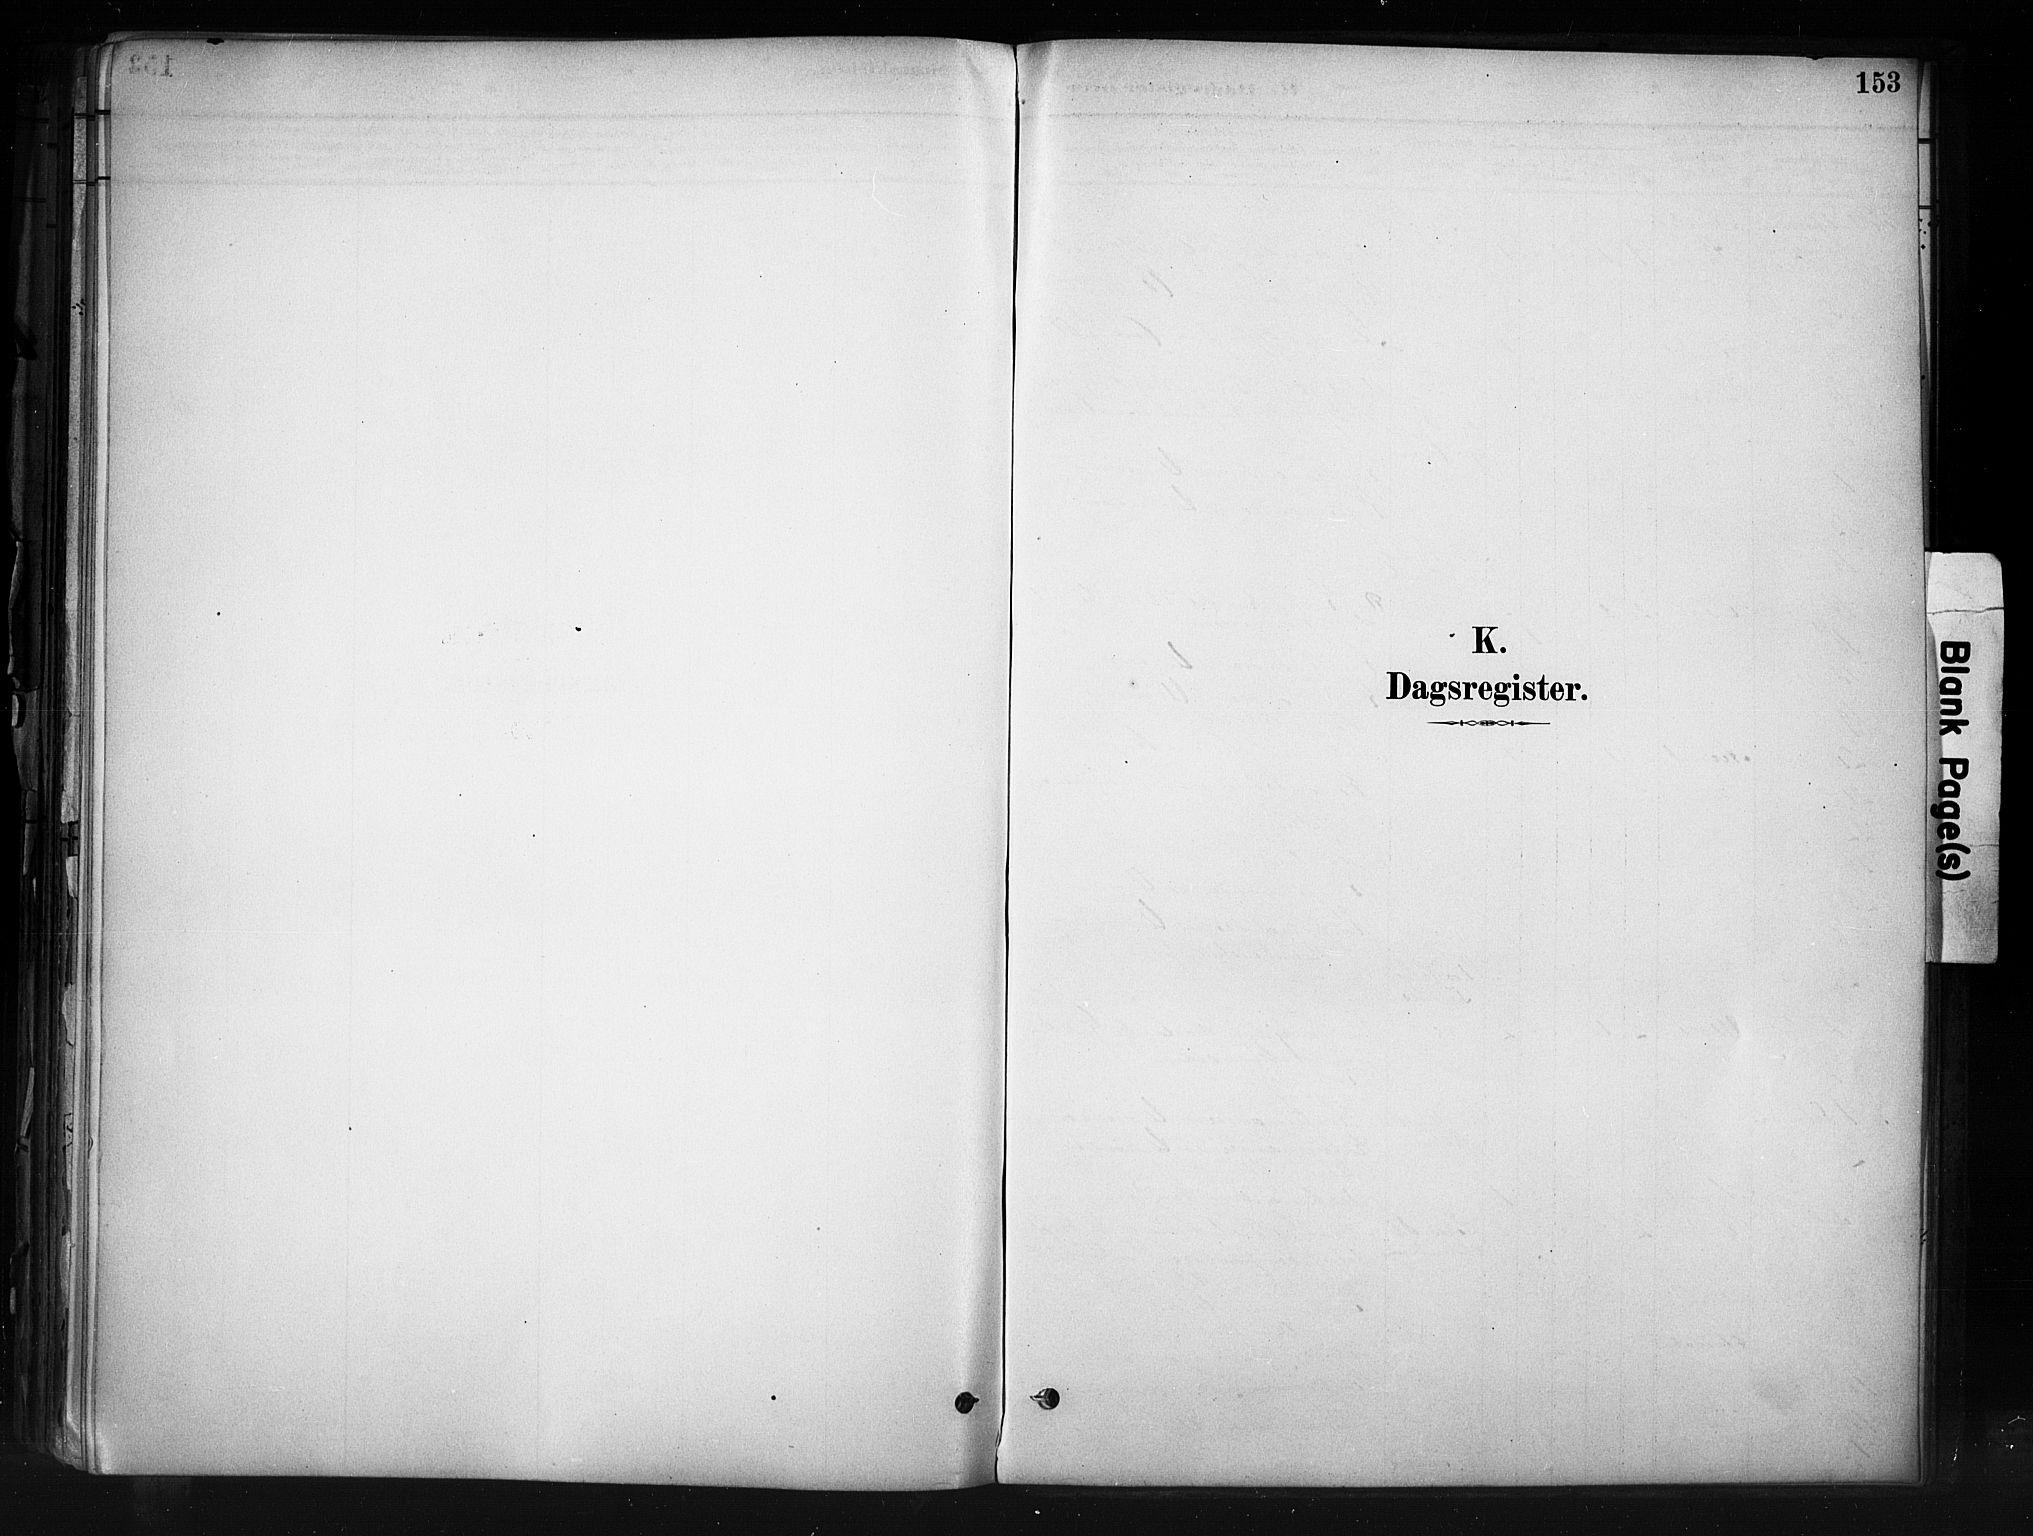 SAH, Nord-Aurdal prestekontor, Ministerialbok nr. 13, 1883-1895, s. 153